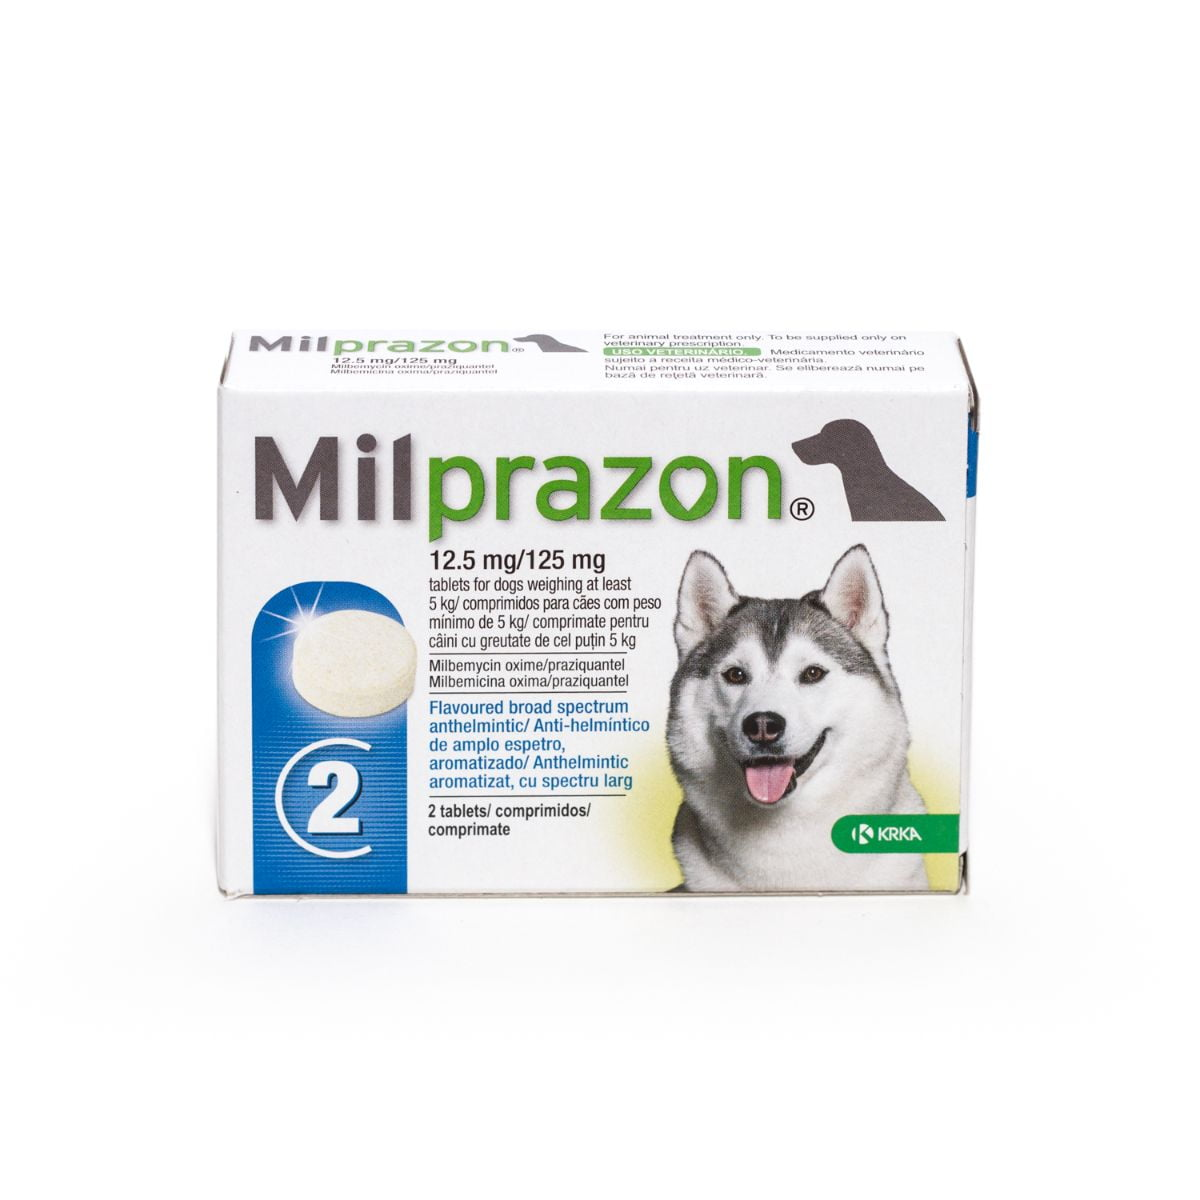 Milprazon 12